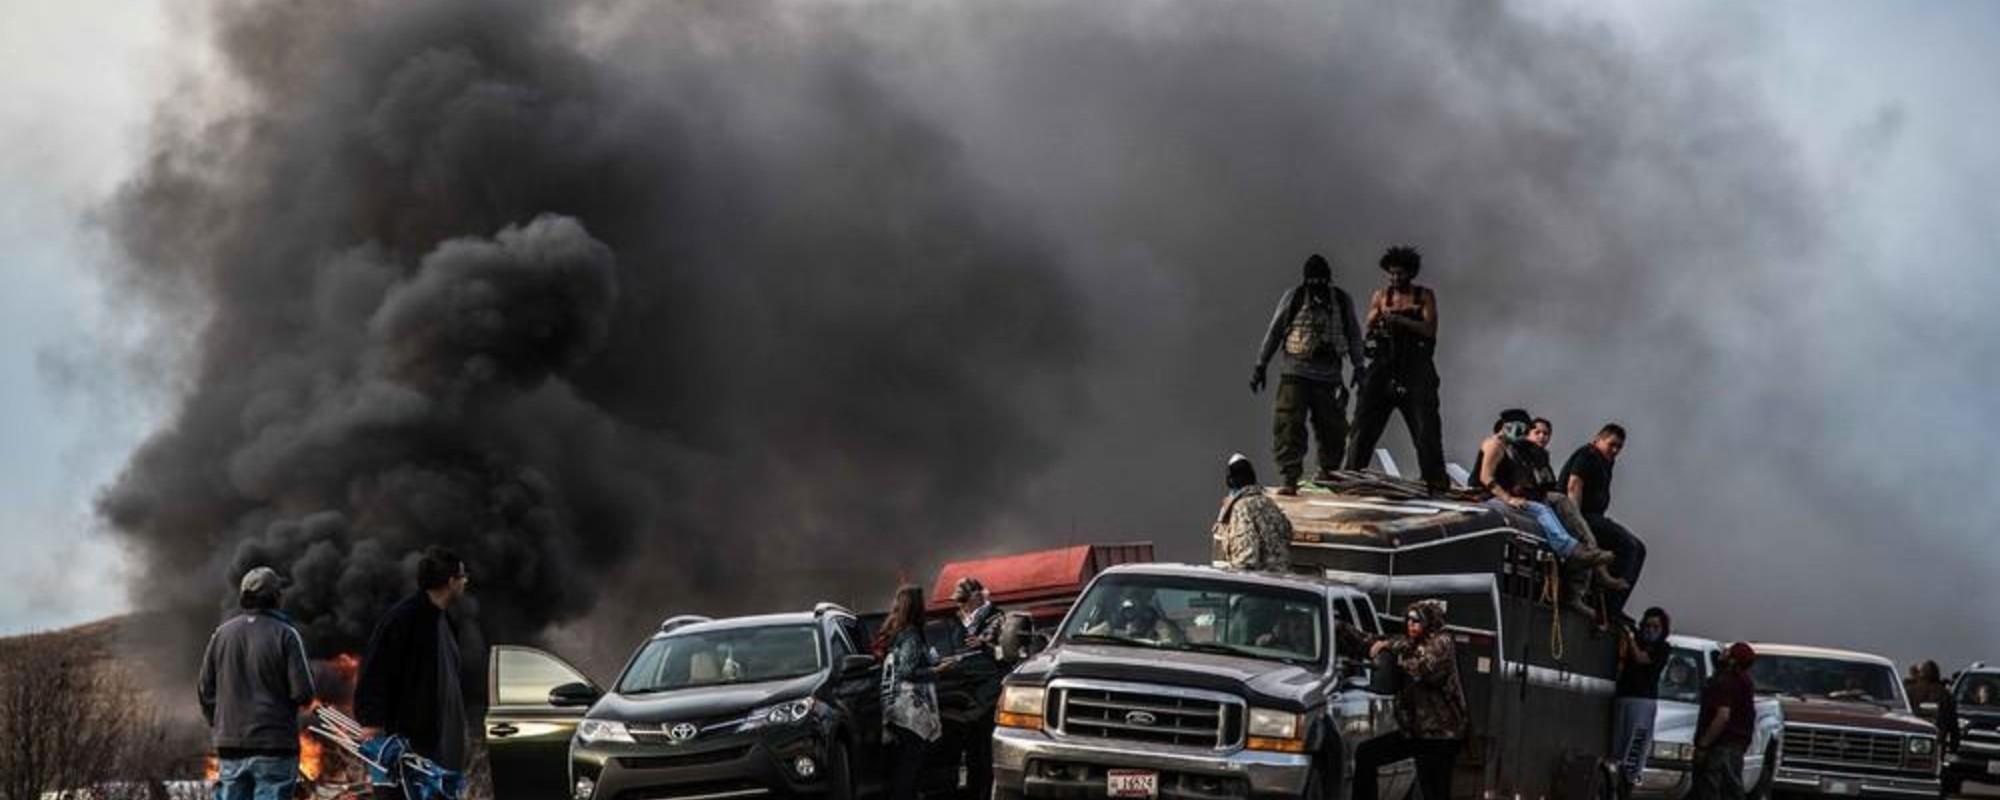 Fotos vom Widerstand in Standing Rock